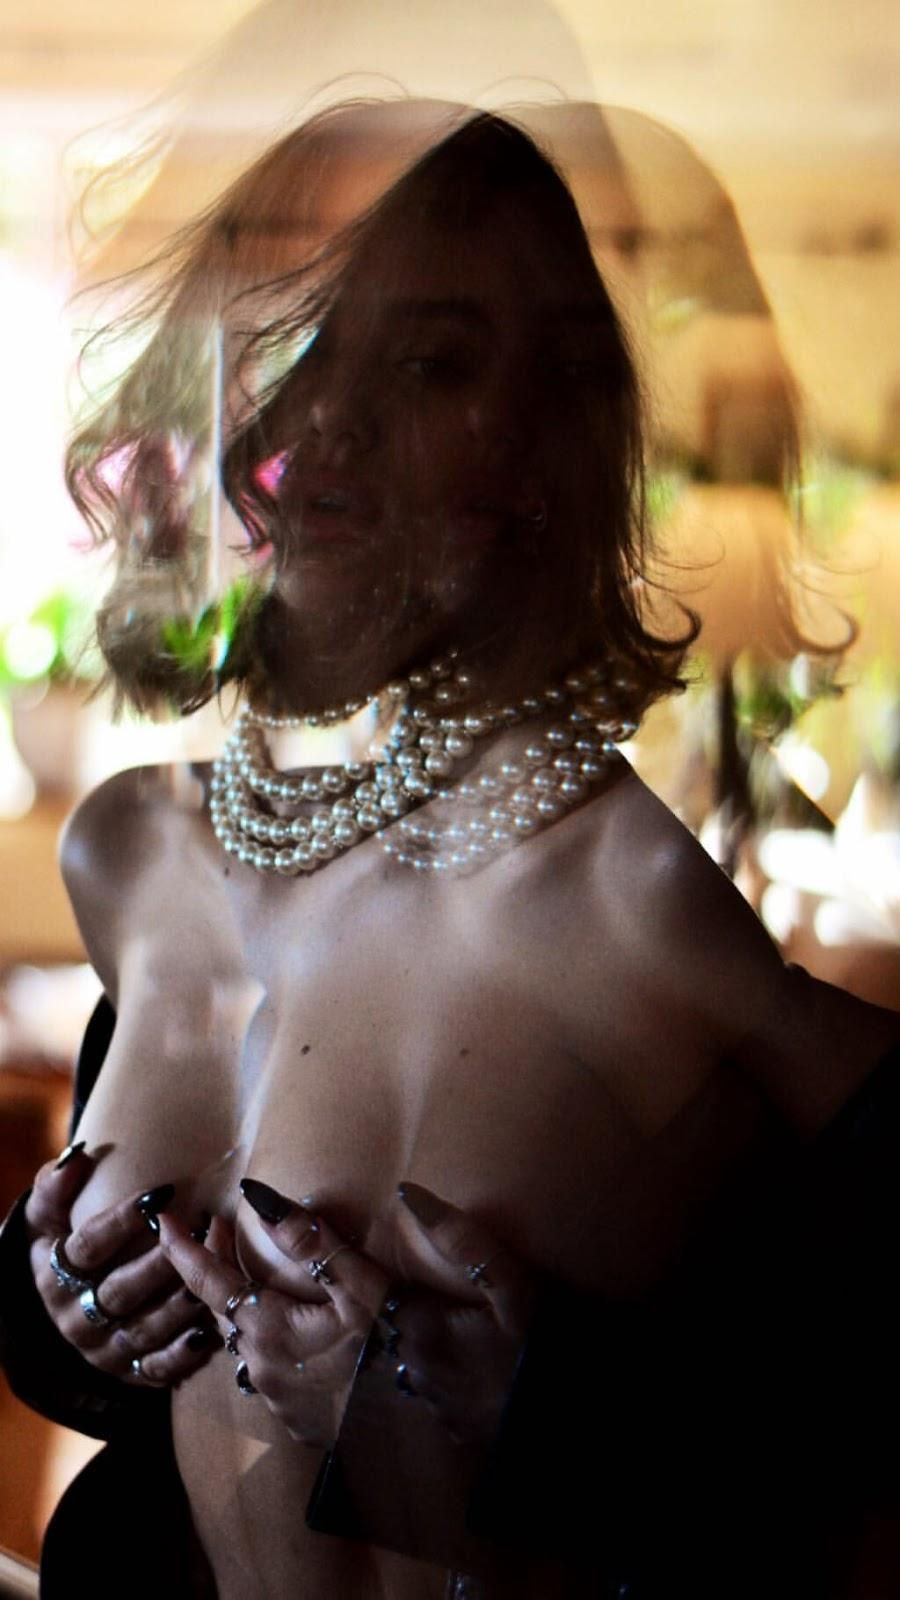 Delilah Belle Hamlin - Photoshoot By Amaury Nessaiba 2019